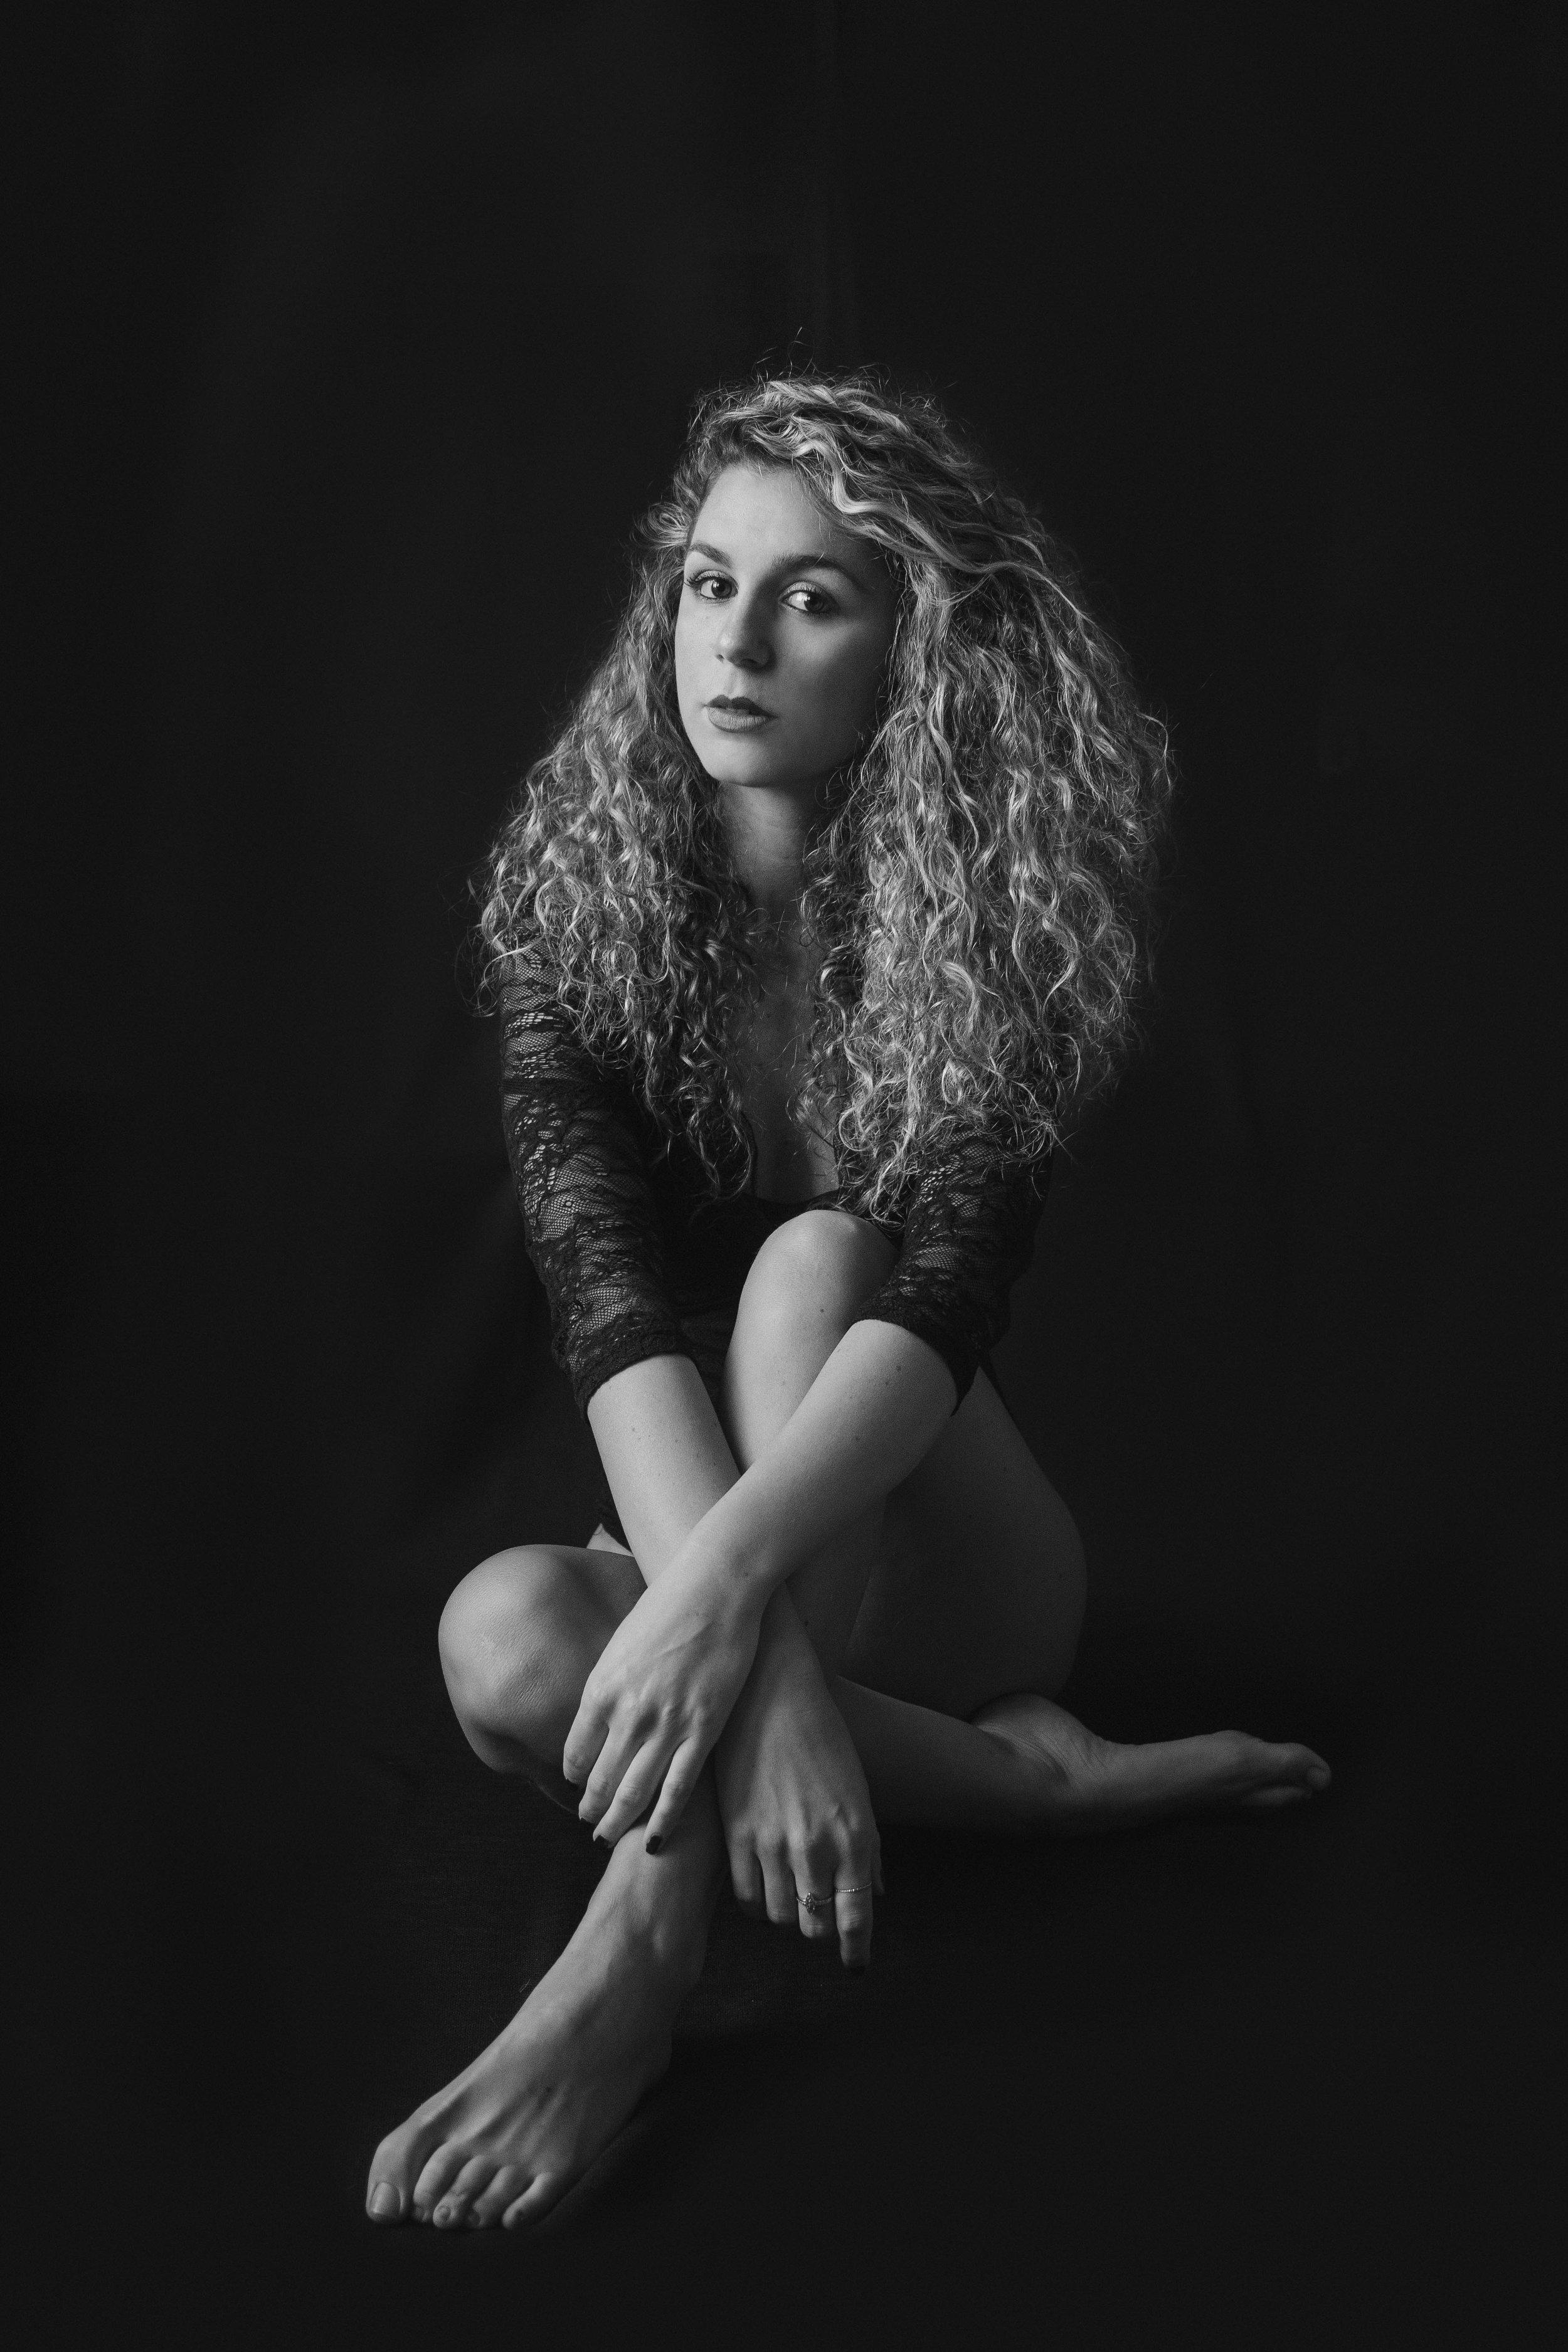 Laura Griffiths Fotografia Turin Italy Portrait Photographer Torino Italia Ritratti Fotografa